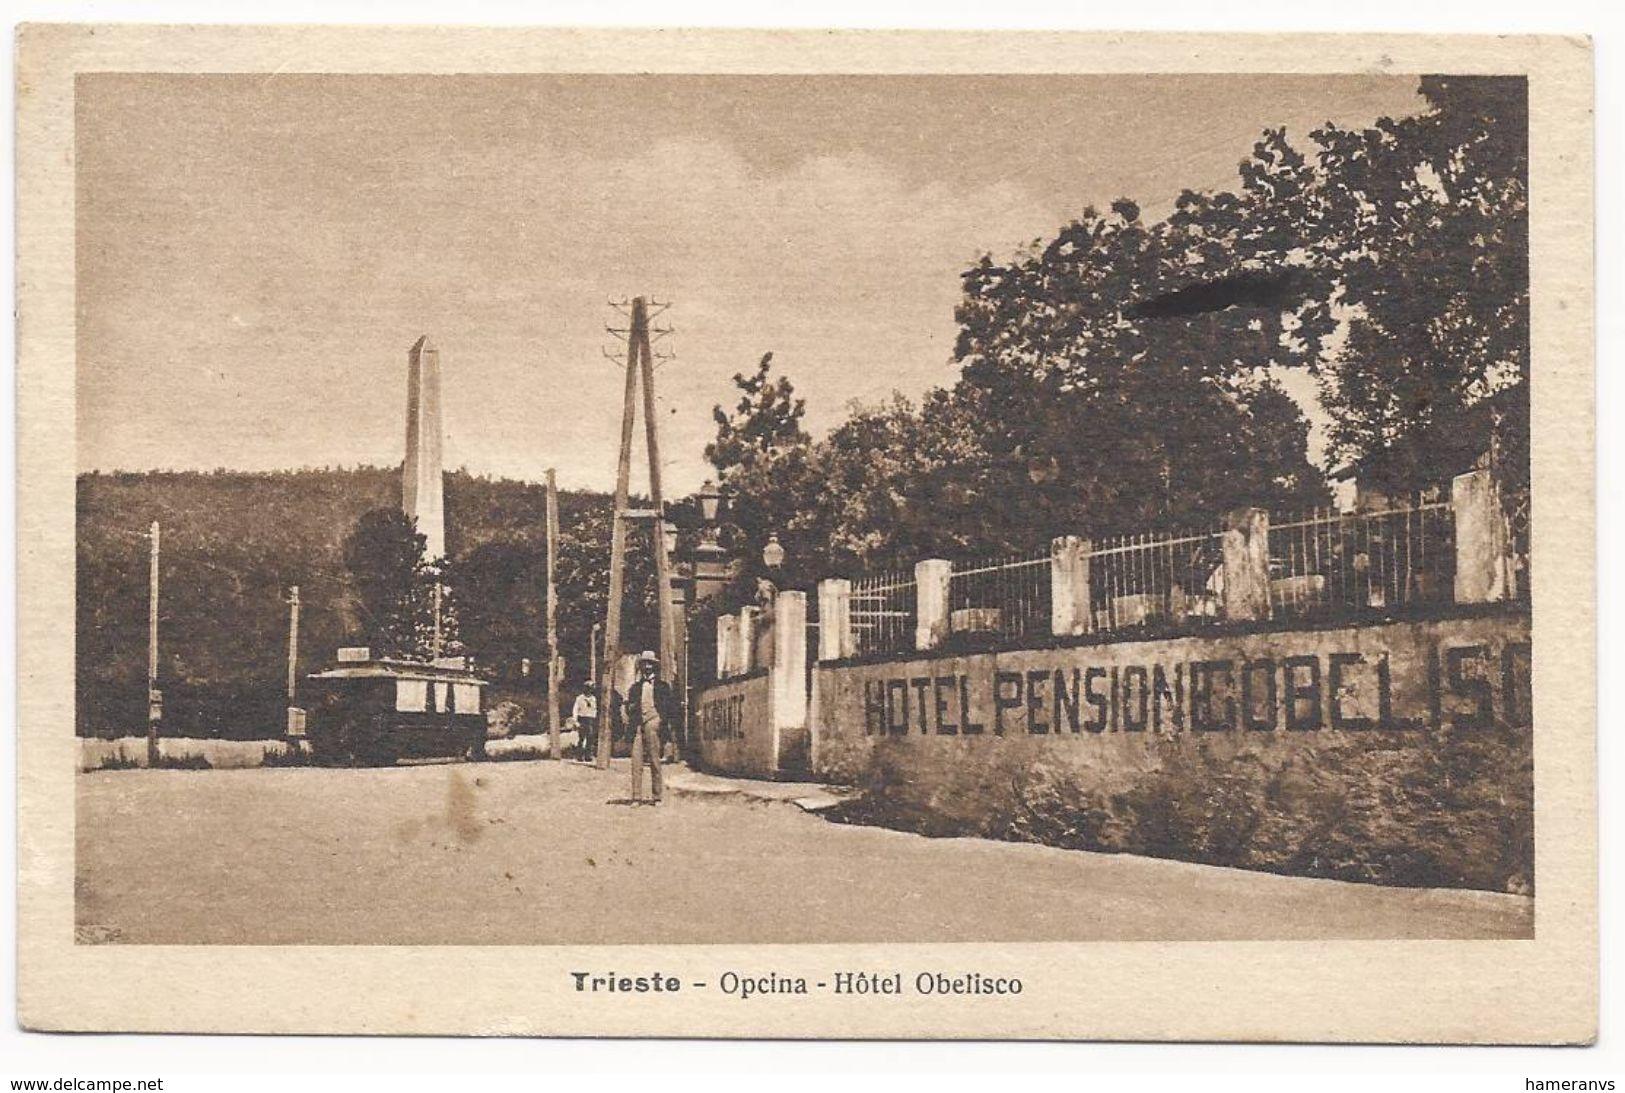 Trieste - Opcina - Hotel Obelisco - HP1219 - Trieste